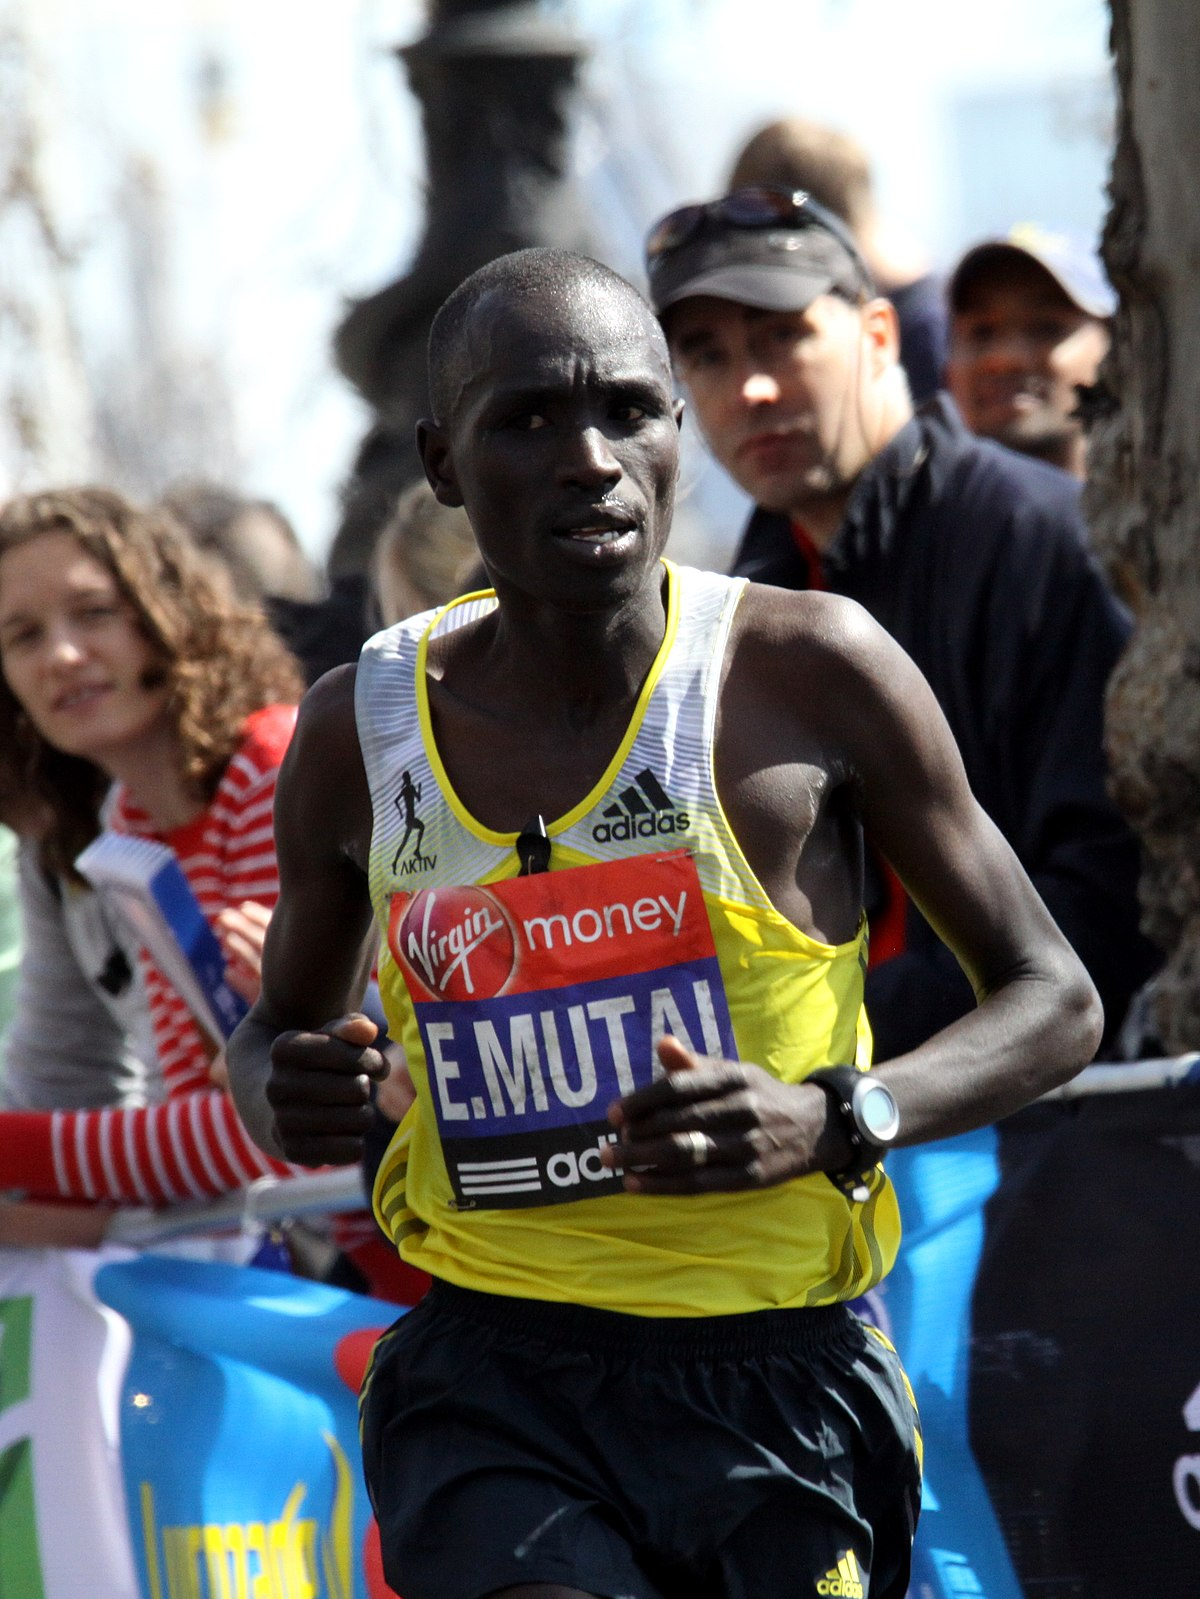 G.Mutai, Korir return to Boston Marathon - Capital Sports